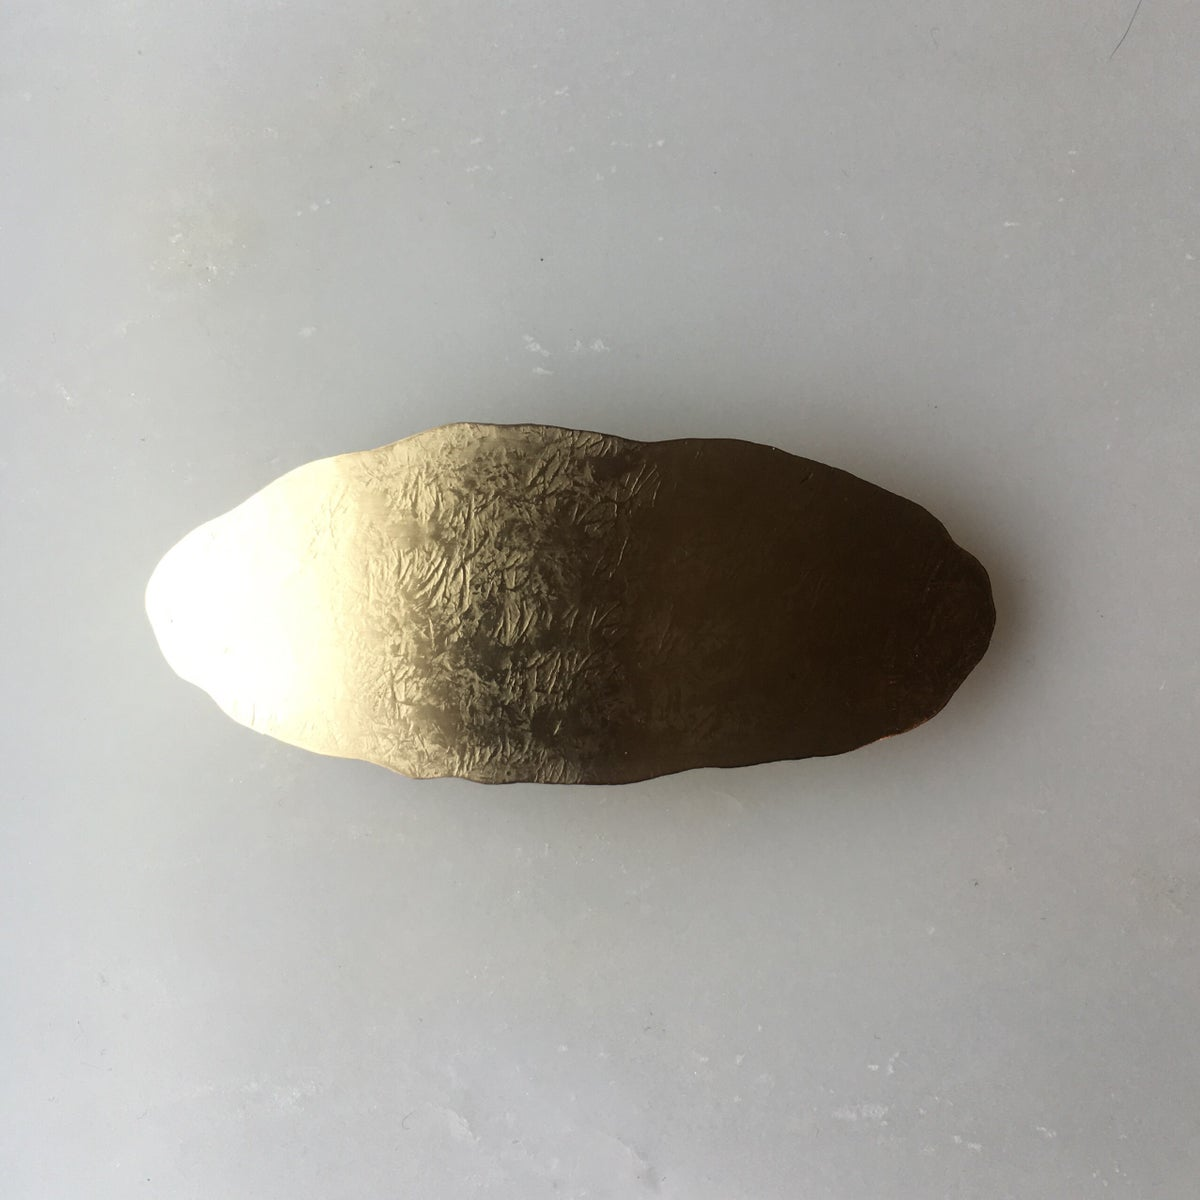 Image of oval barrette